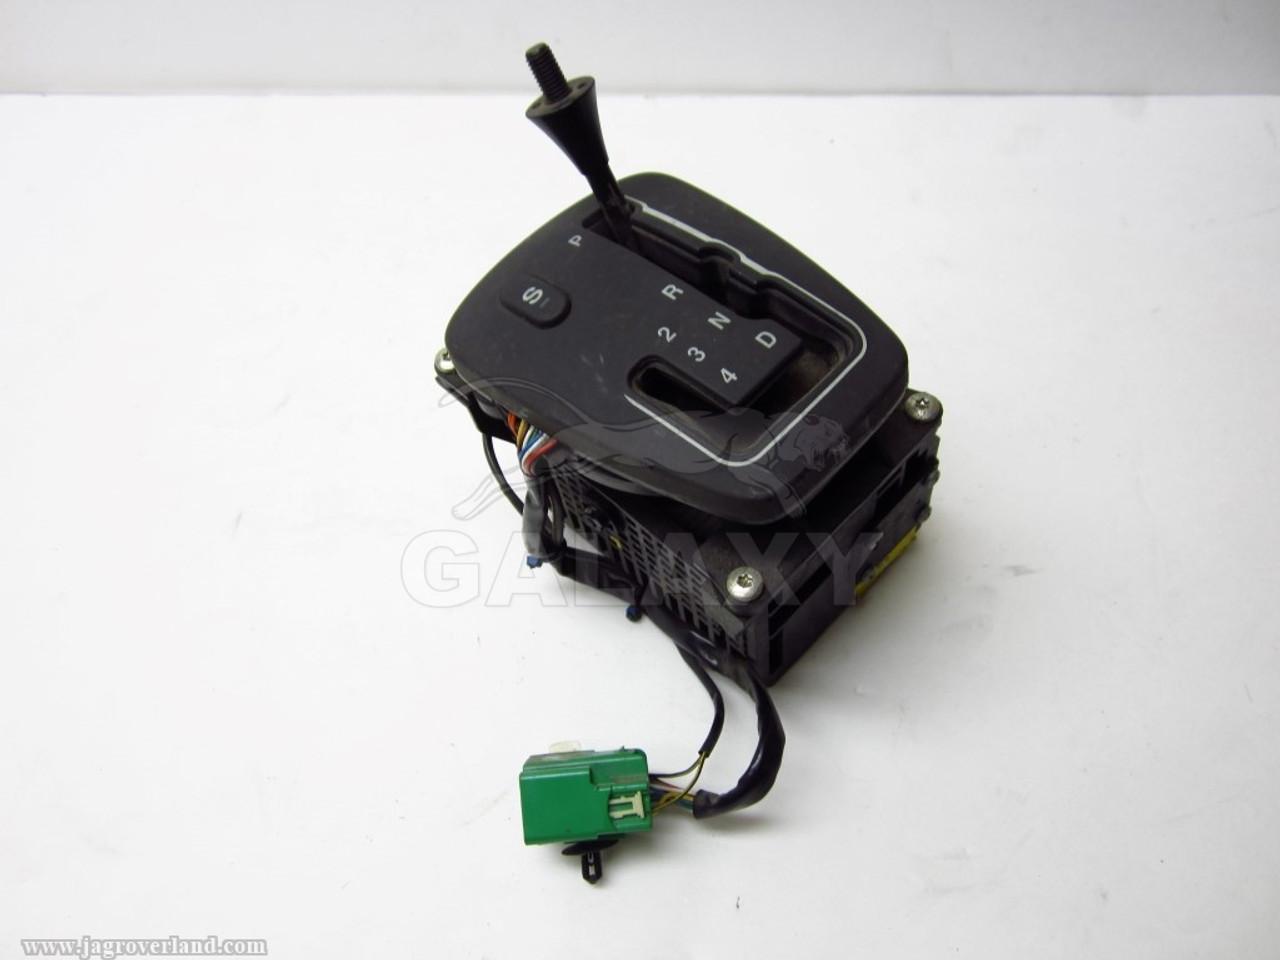 02-08 X-Type Floor Shifter Gear Selector Indicator Module 1X43-7C453-Ah